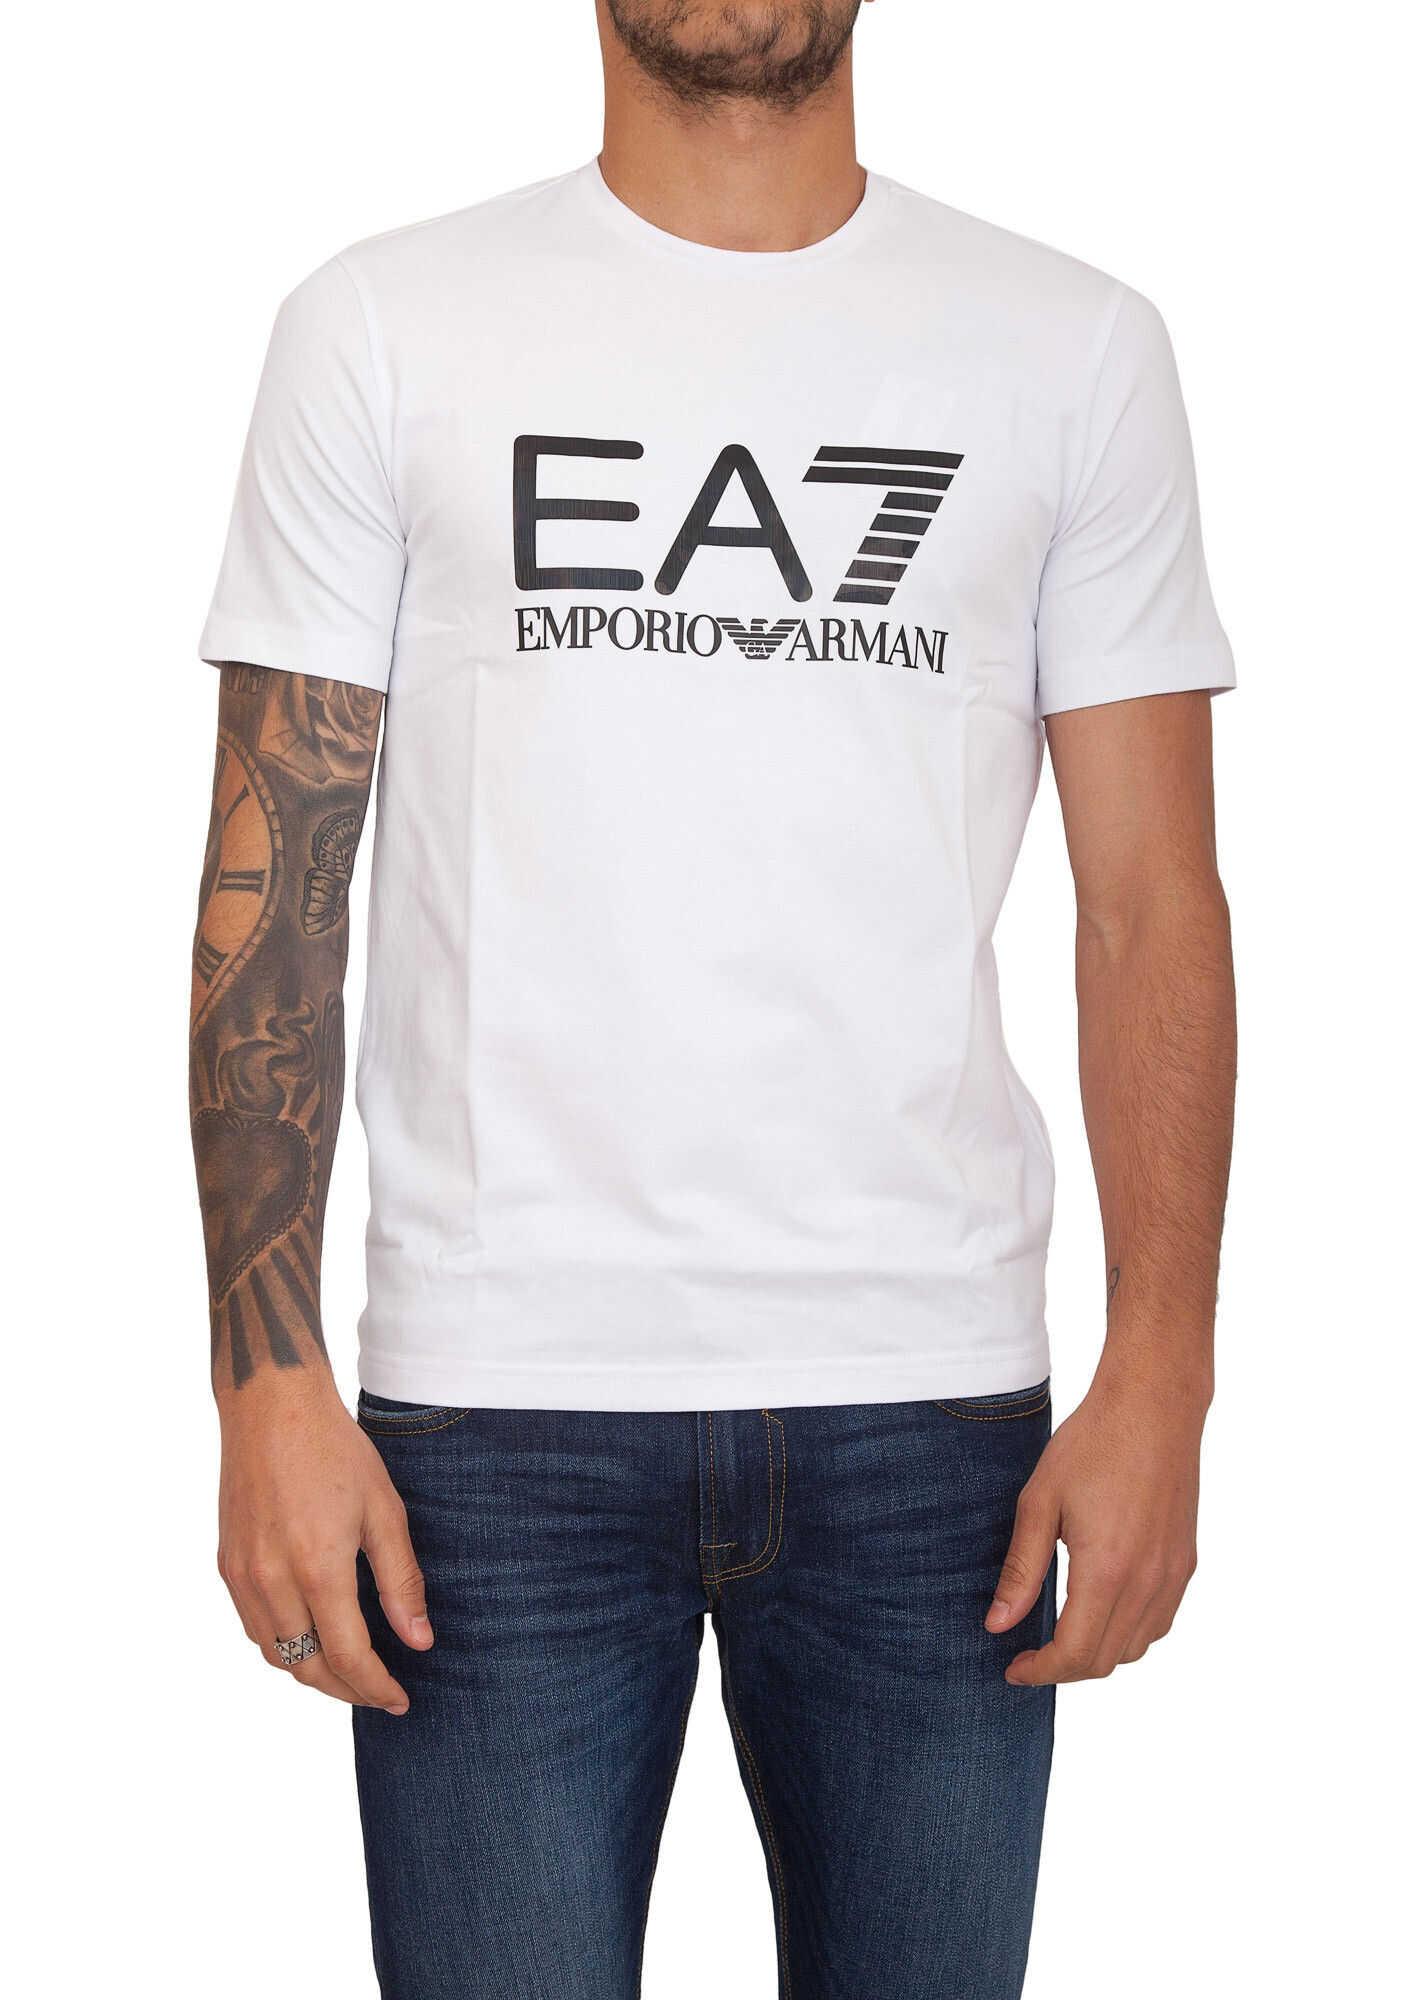 EA7 C9000073 WHITE